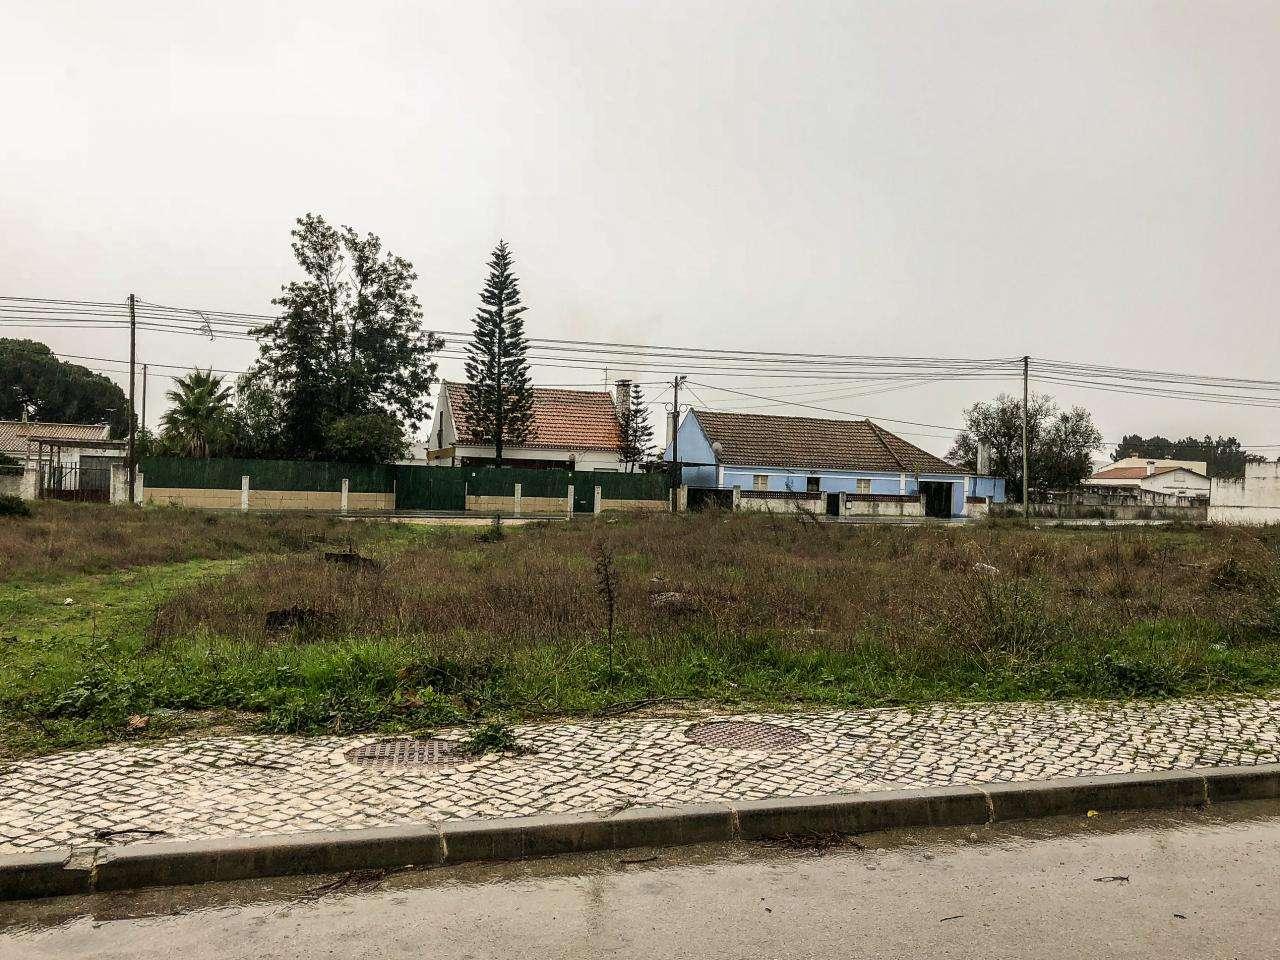 Terreno para comprar, Quinta do Anjo, Palmela, Setúbal - Foto 2